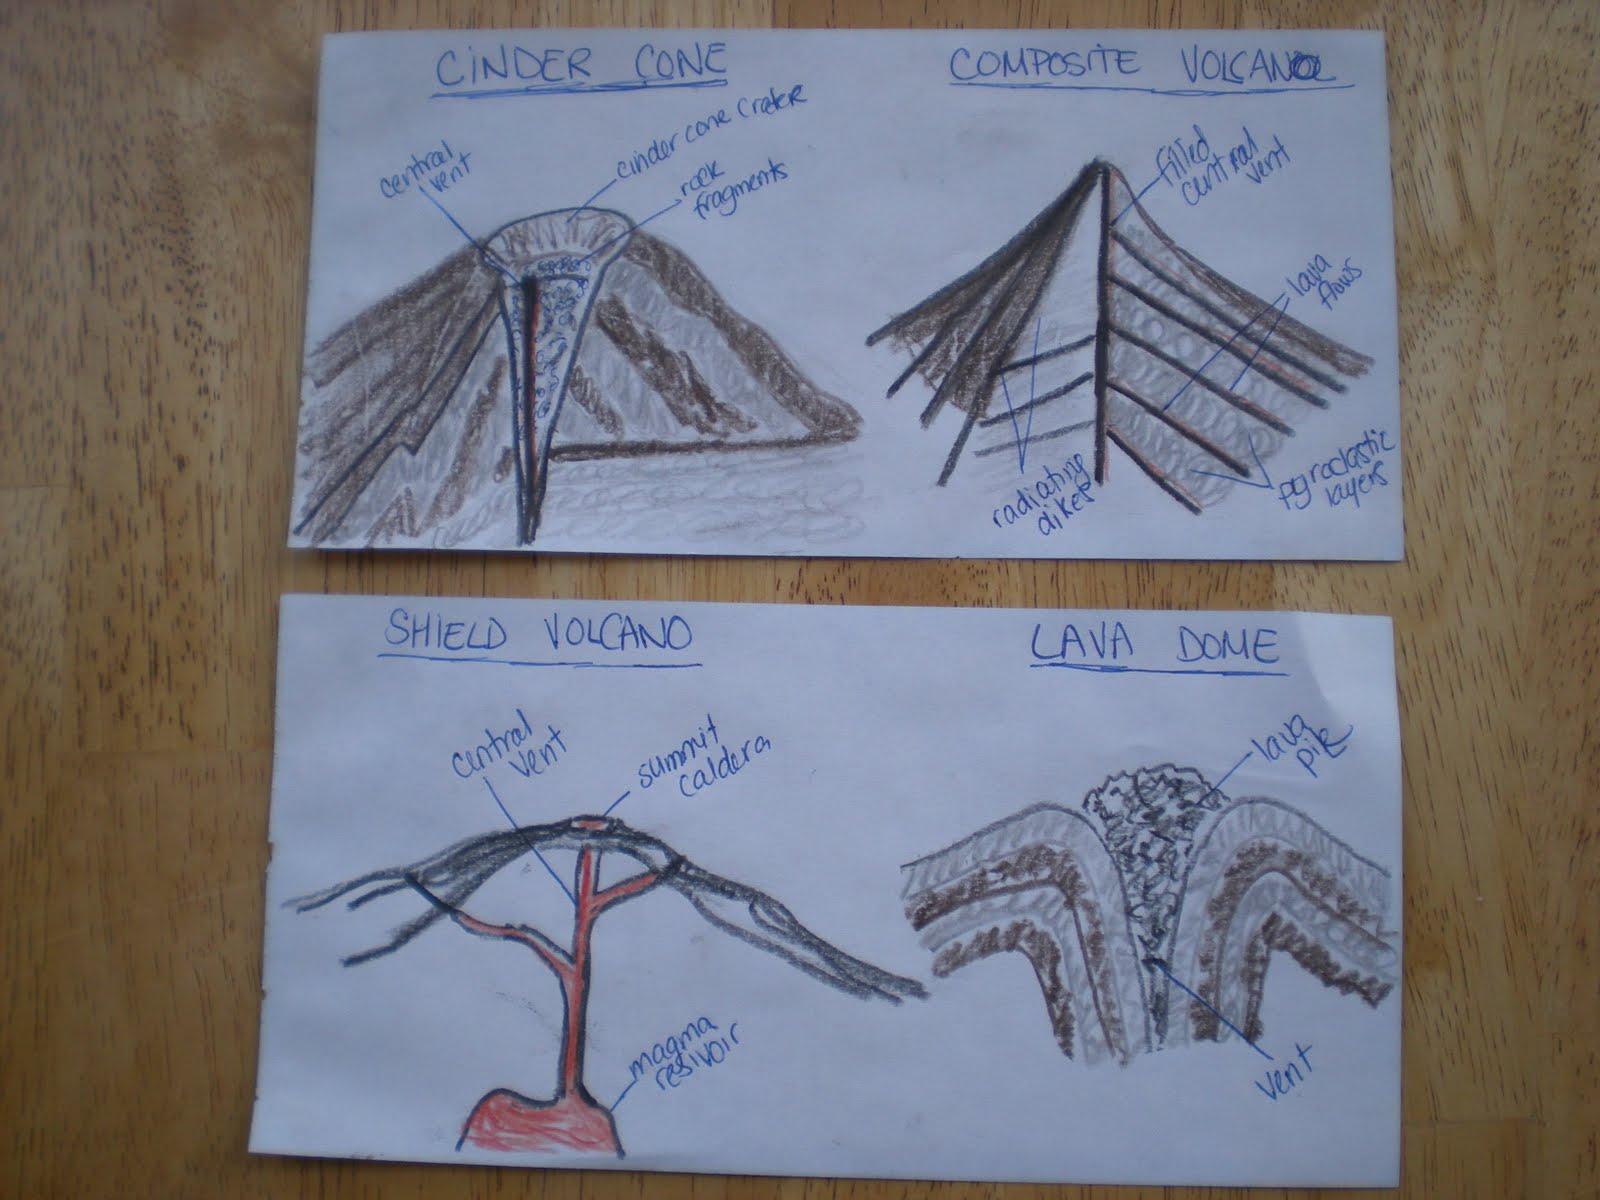 Capture california adventure 15 draw and label all 4 types of adventure 15 draw and label all 4 types of volcanoes in north america sciox Choice Image